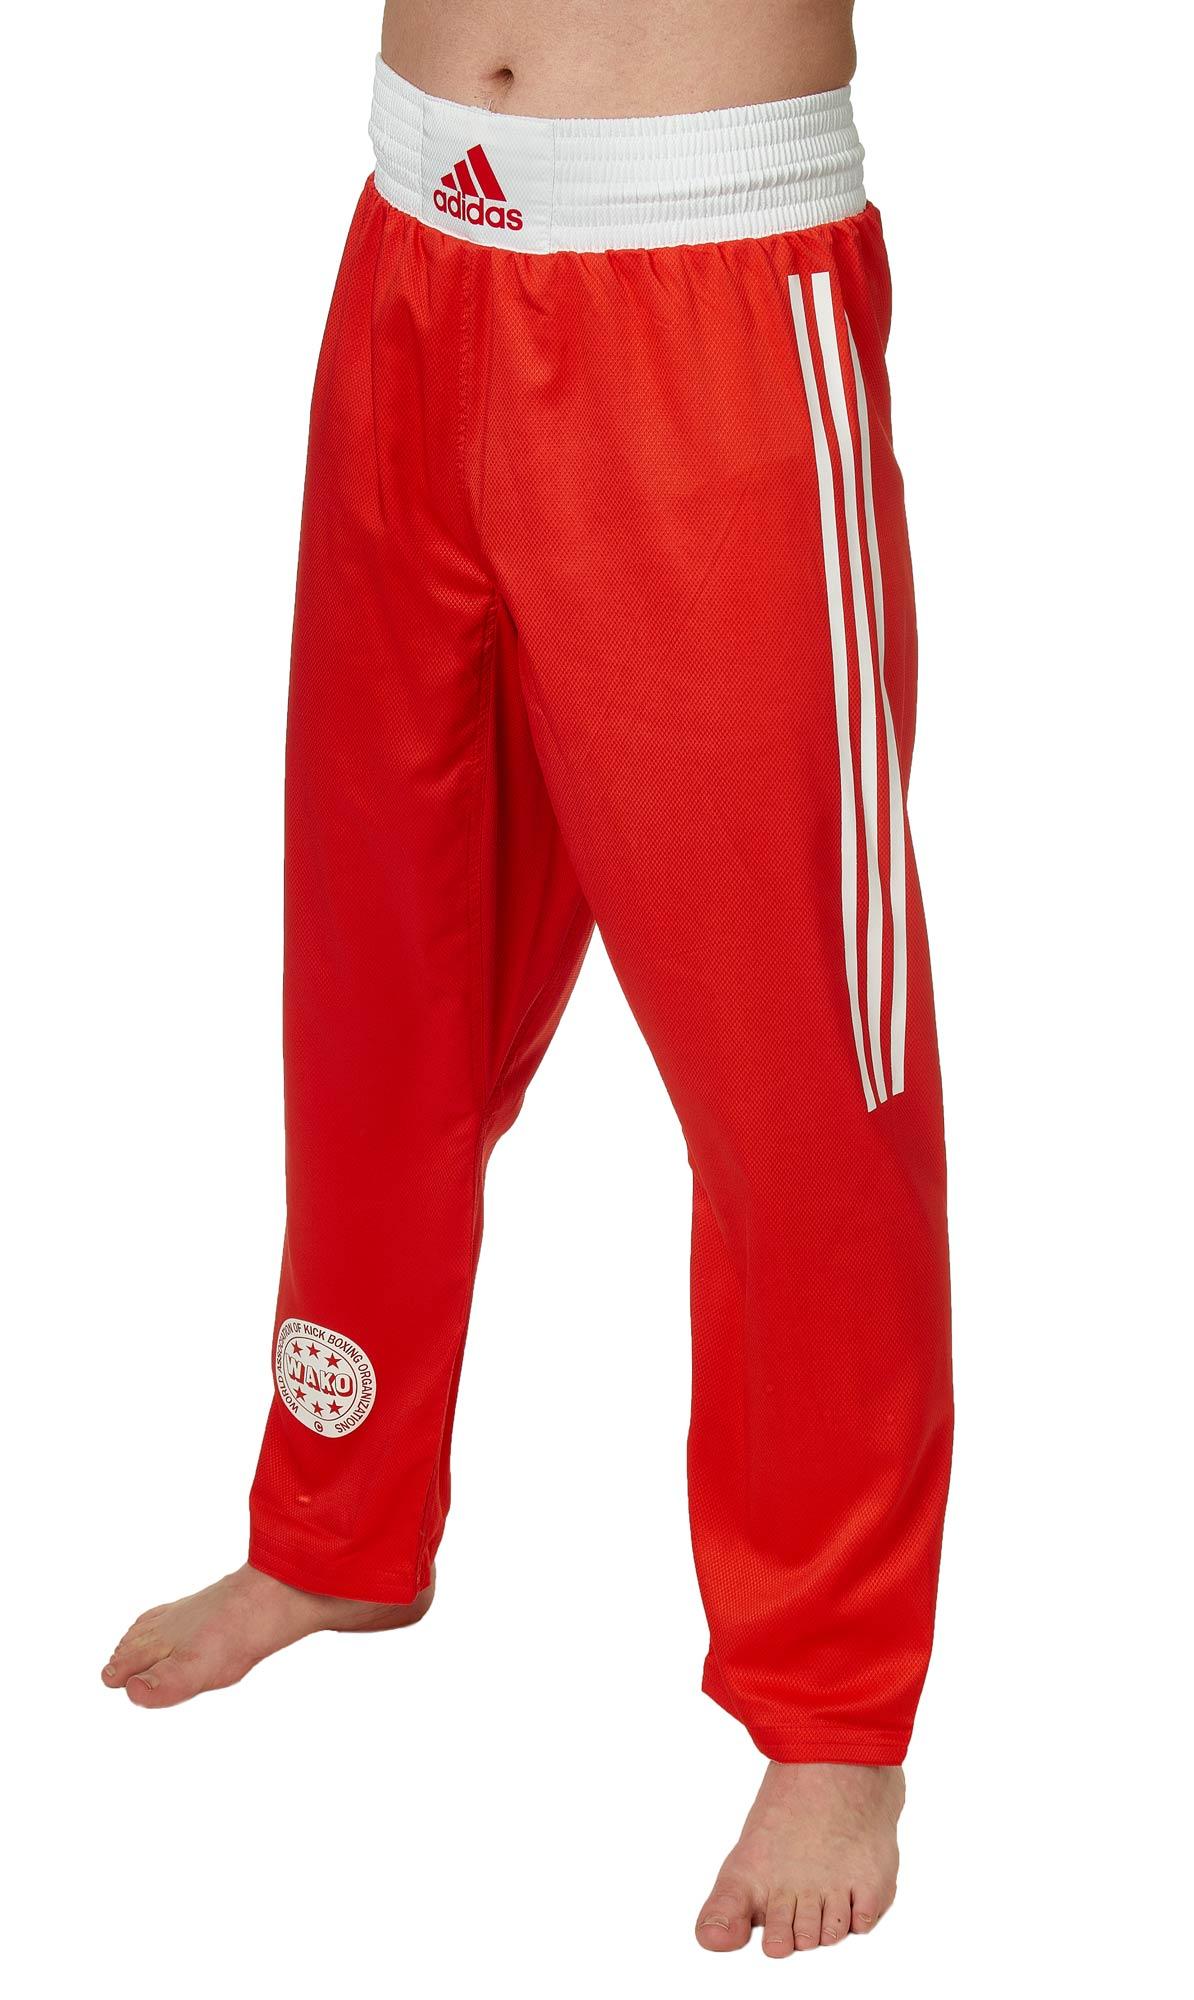 adidas Full Contact Pants Micro Diamond red, ADIFCP1